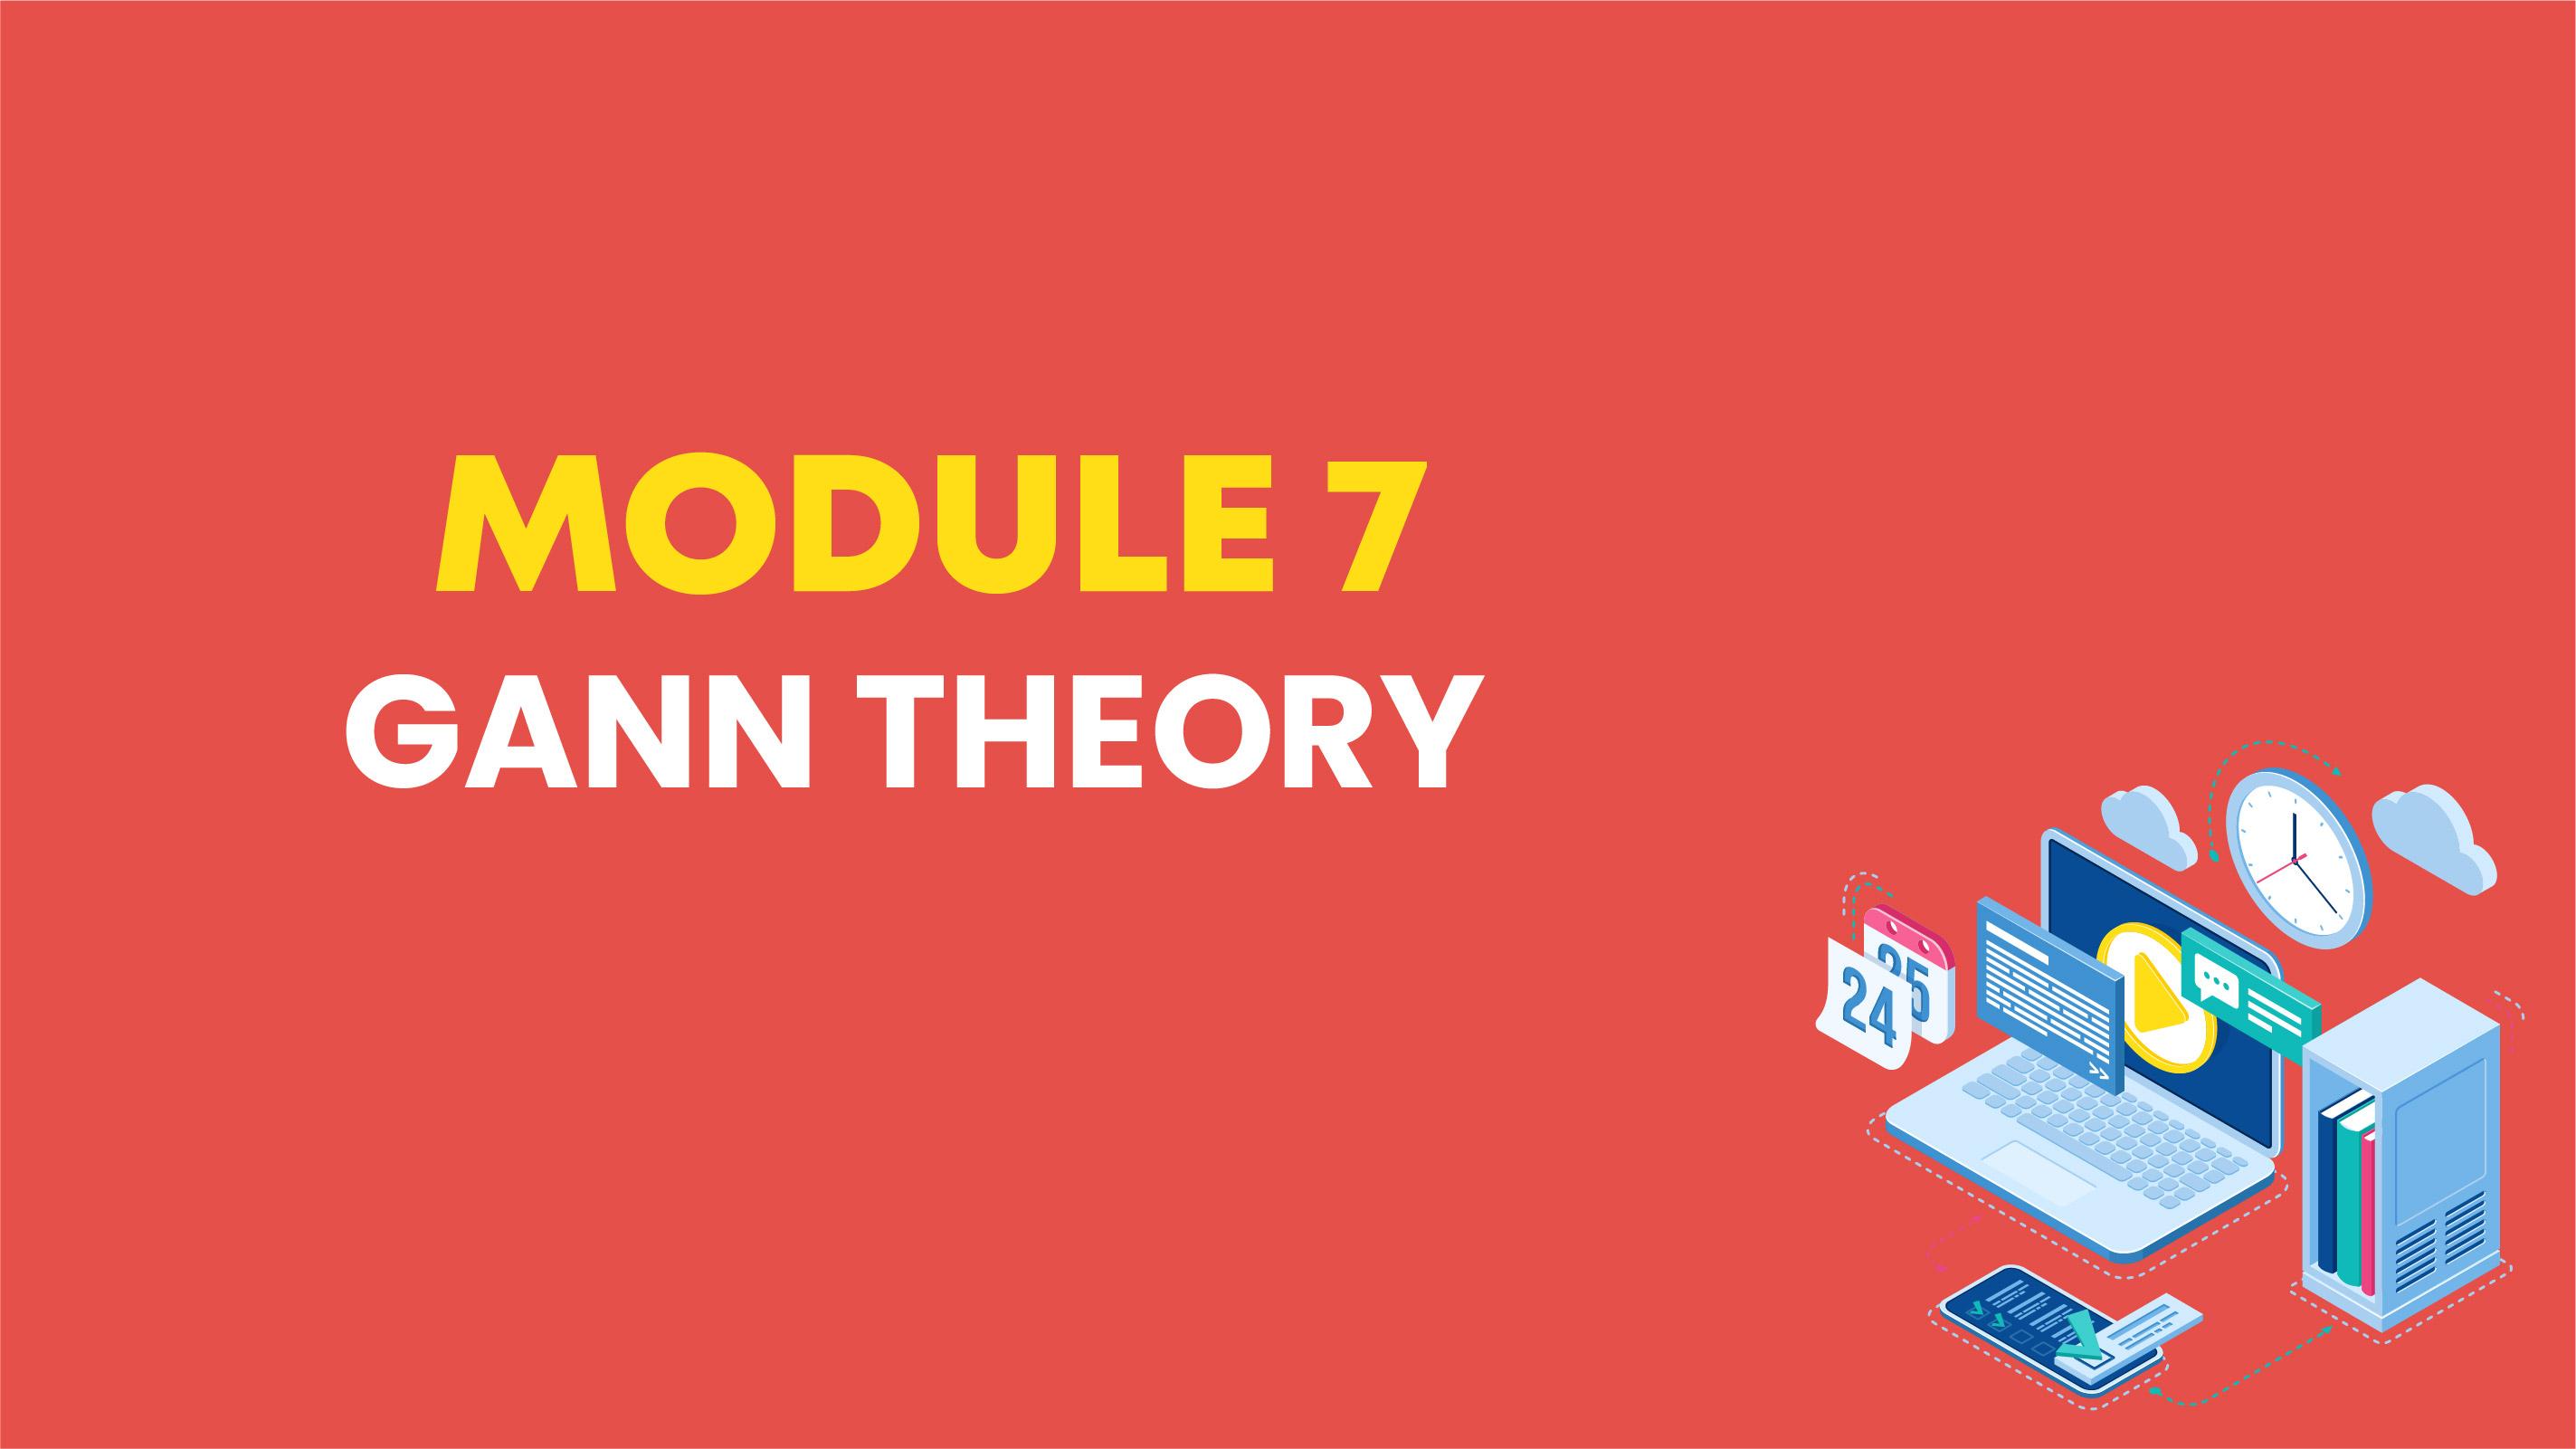 MODULE 7: GANN THEORY